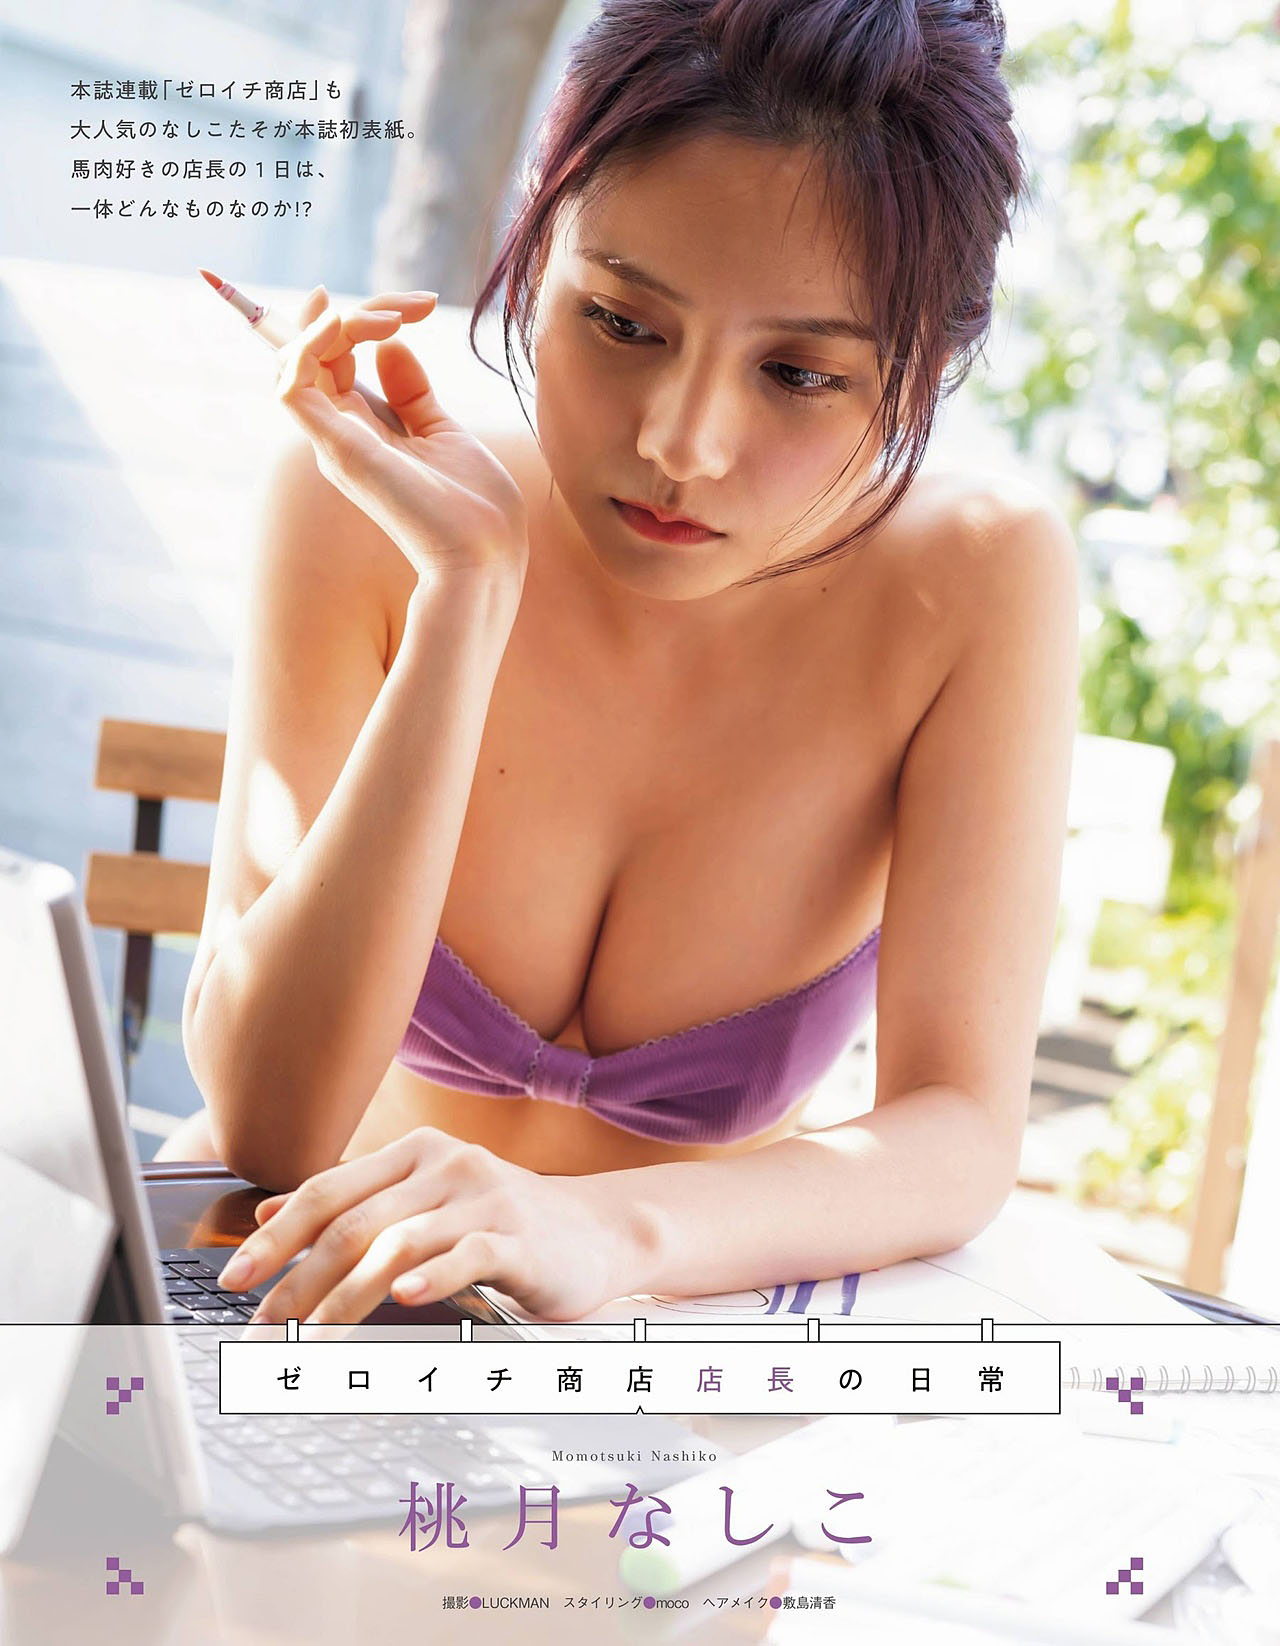 NMomotsuki ExTaishu 2104 02.jpg